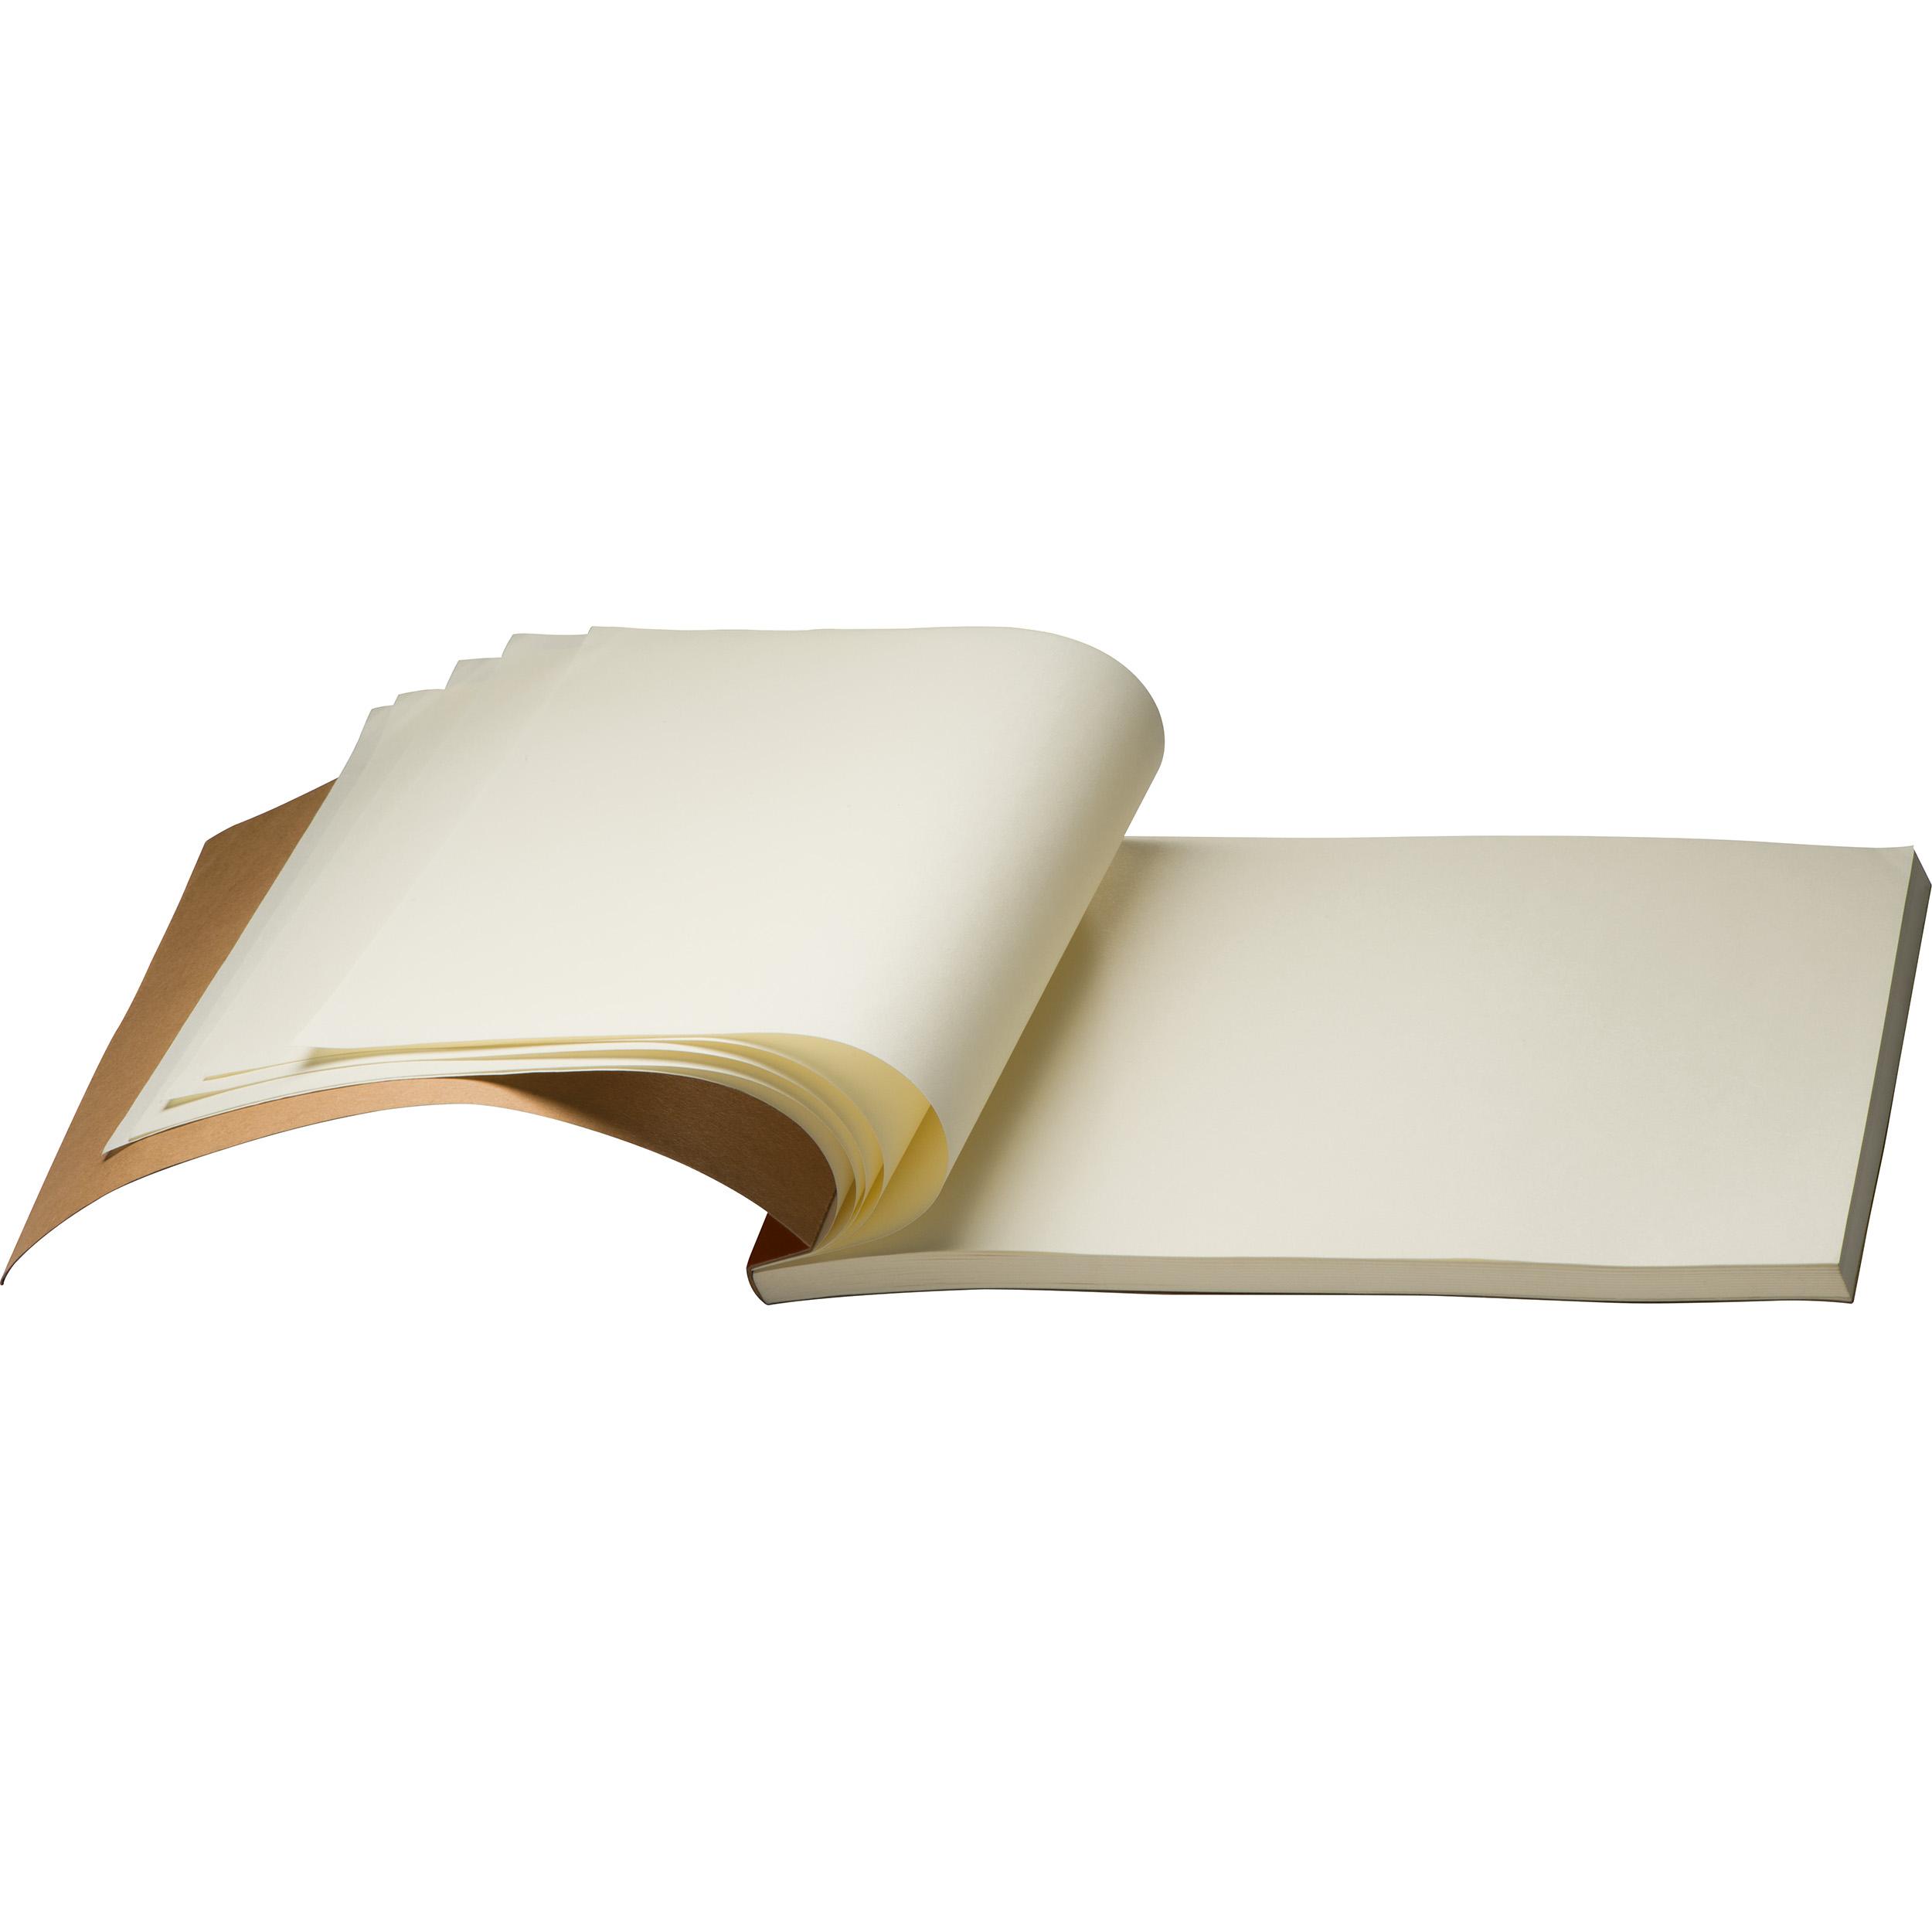 Notizbuch mit flexiblem Kartonumschlag